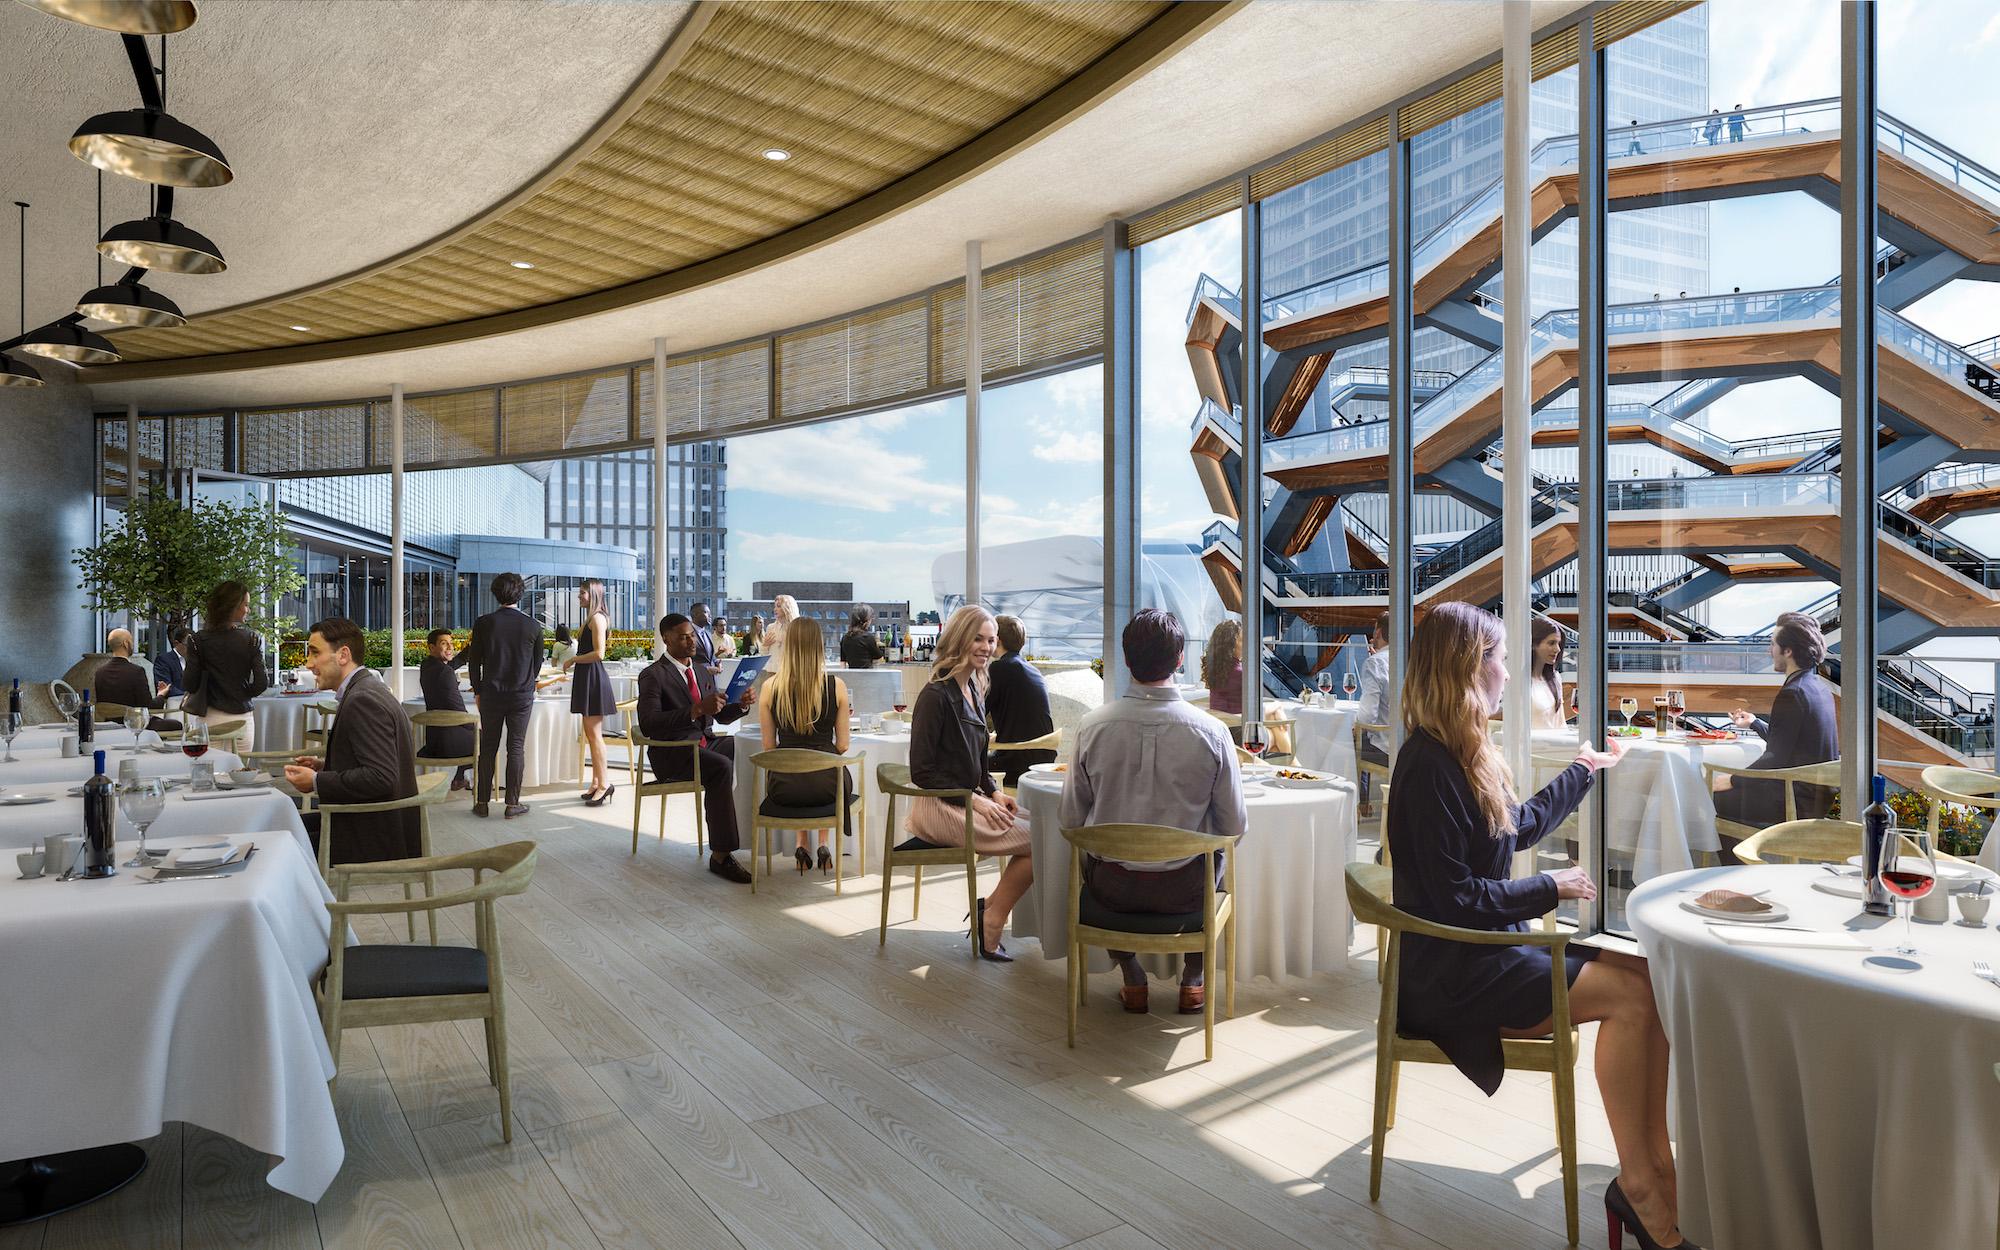 New york restaurant celebrity spots